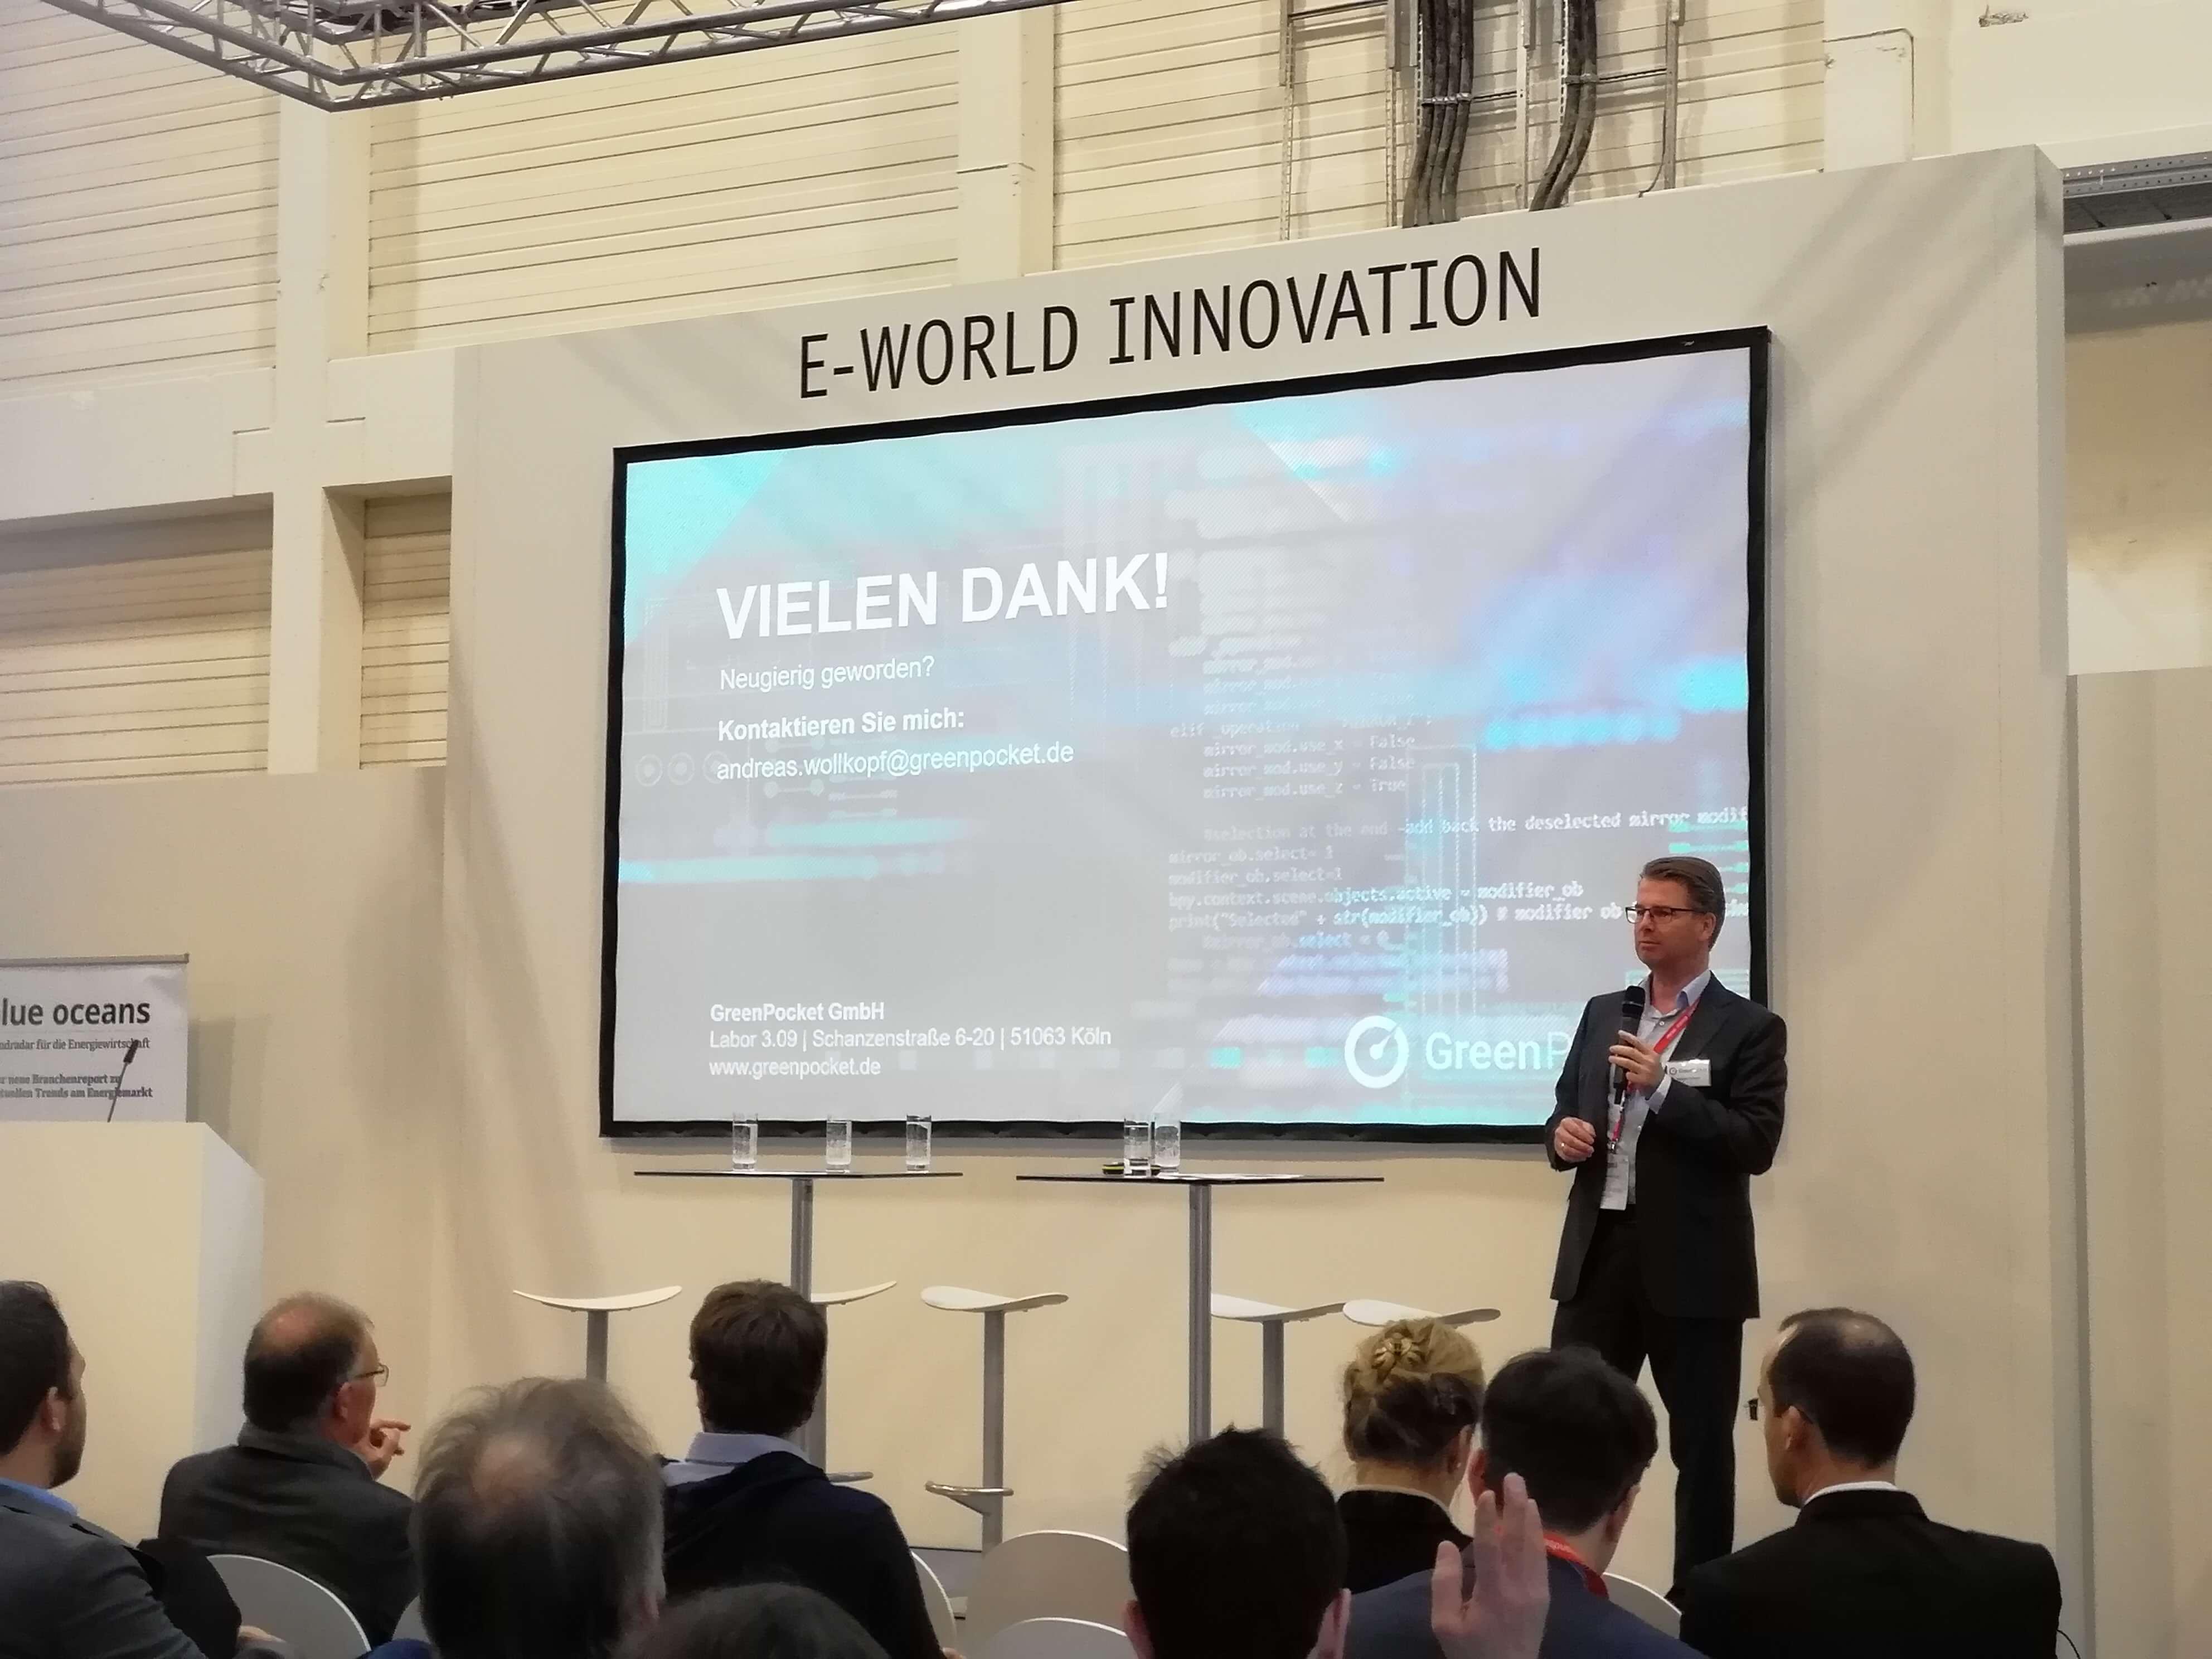 Andreas Wollkopf, Sales Manager